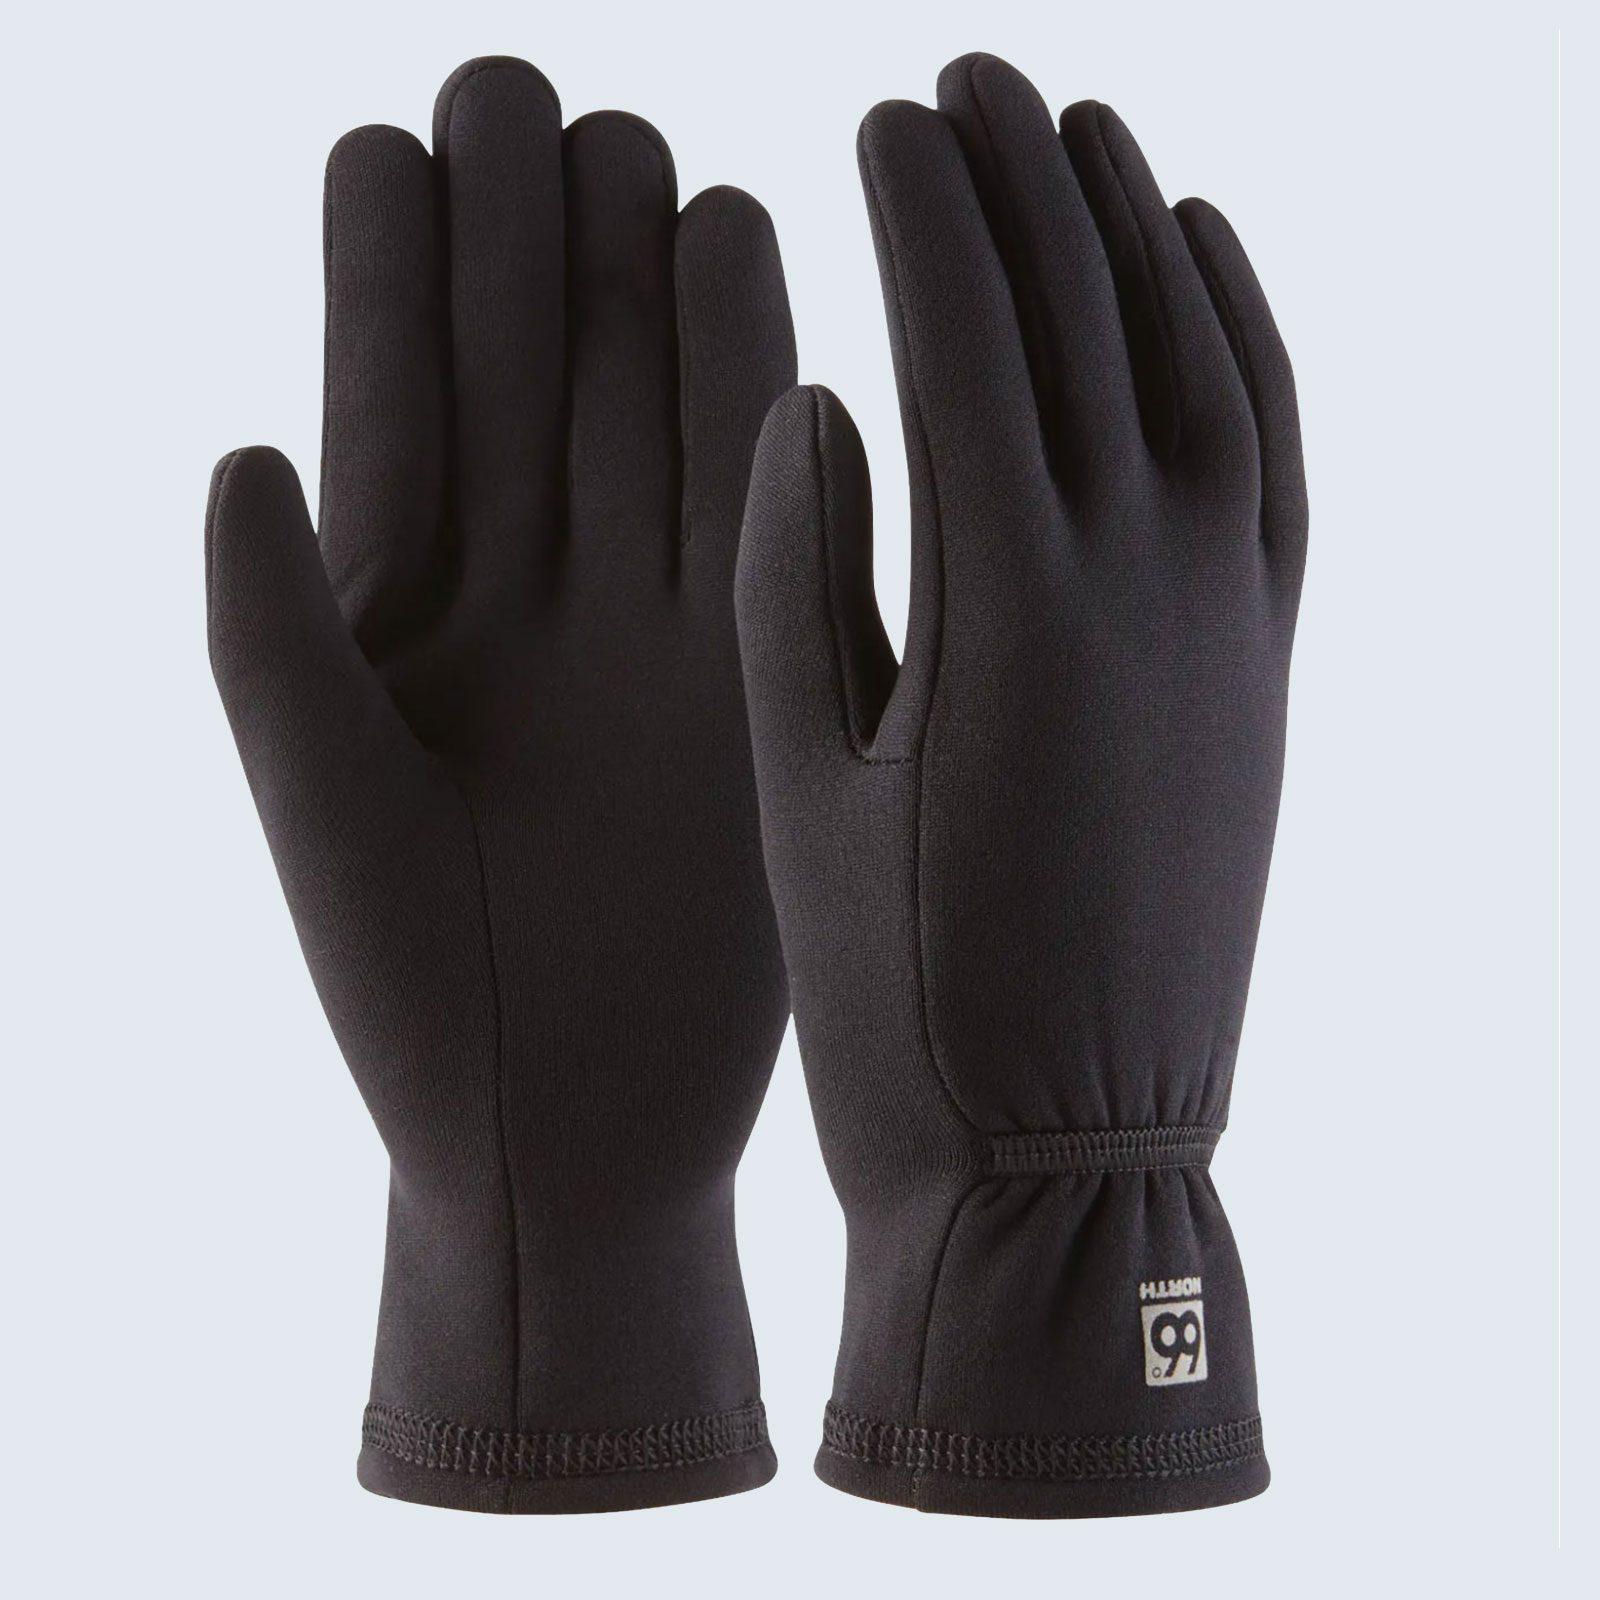 66ºNorth Vik Polartec Power Stretch Gloves